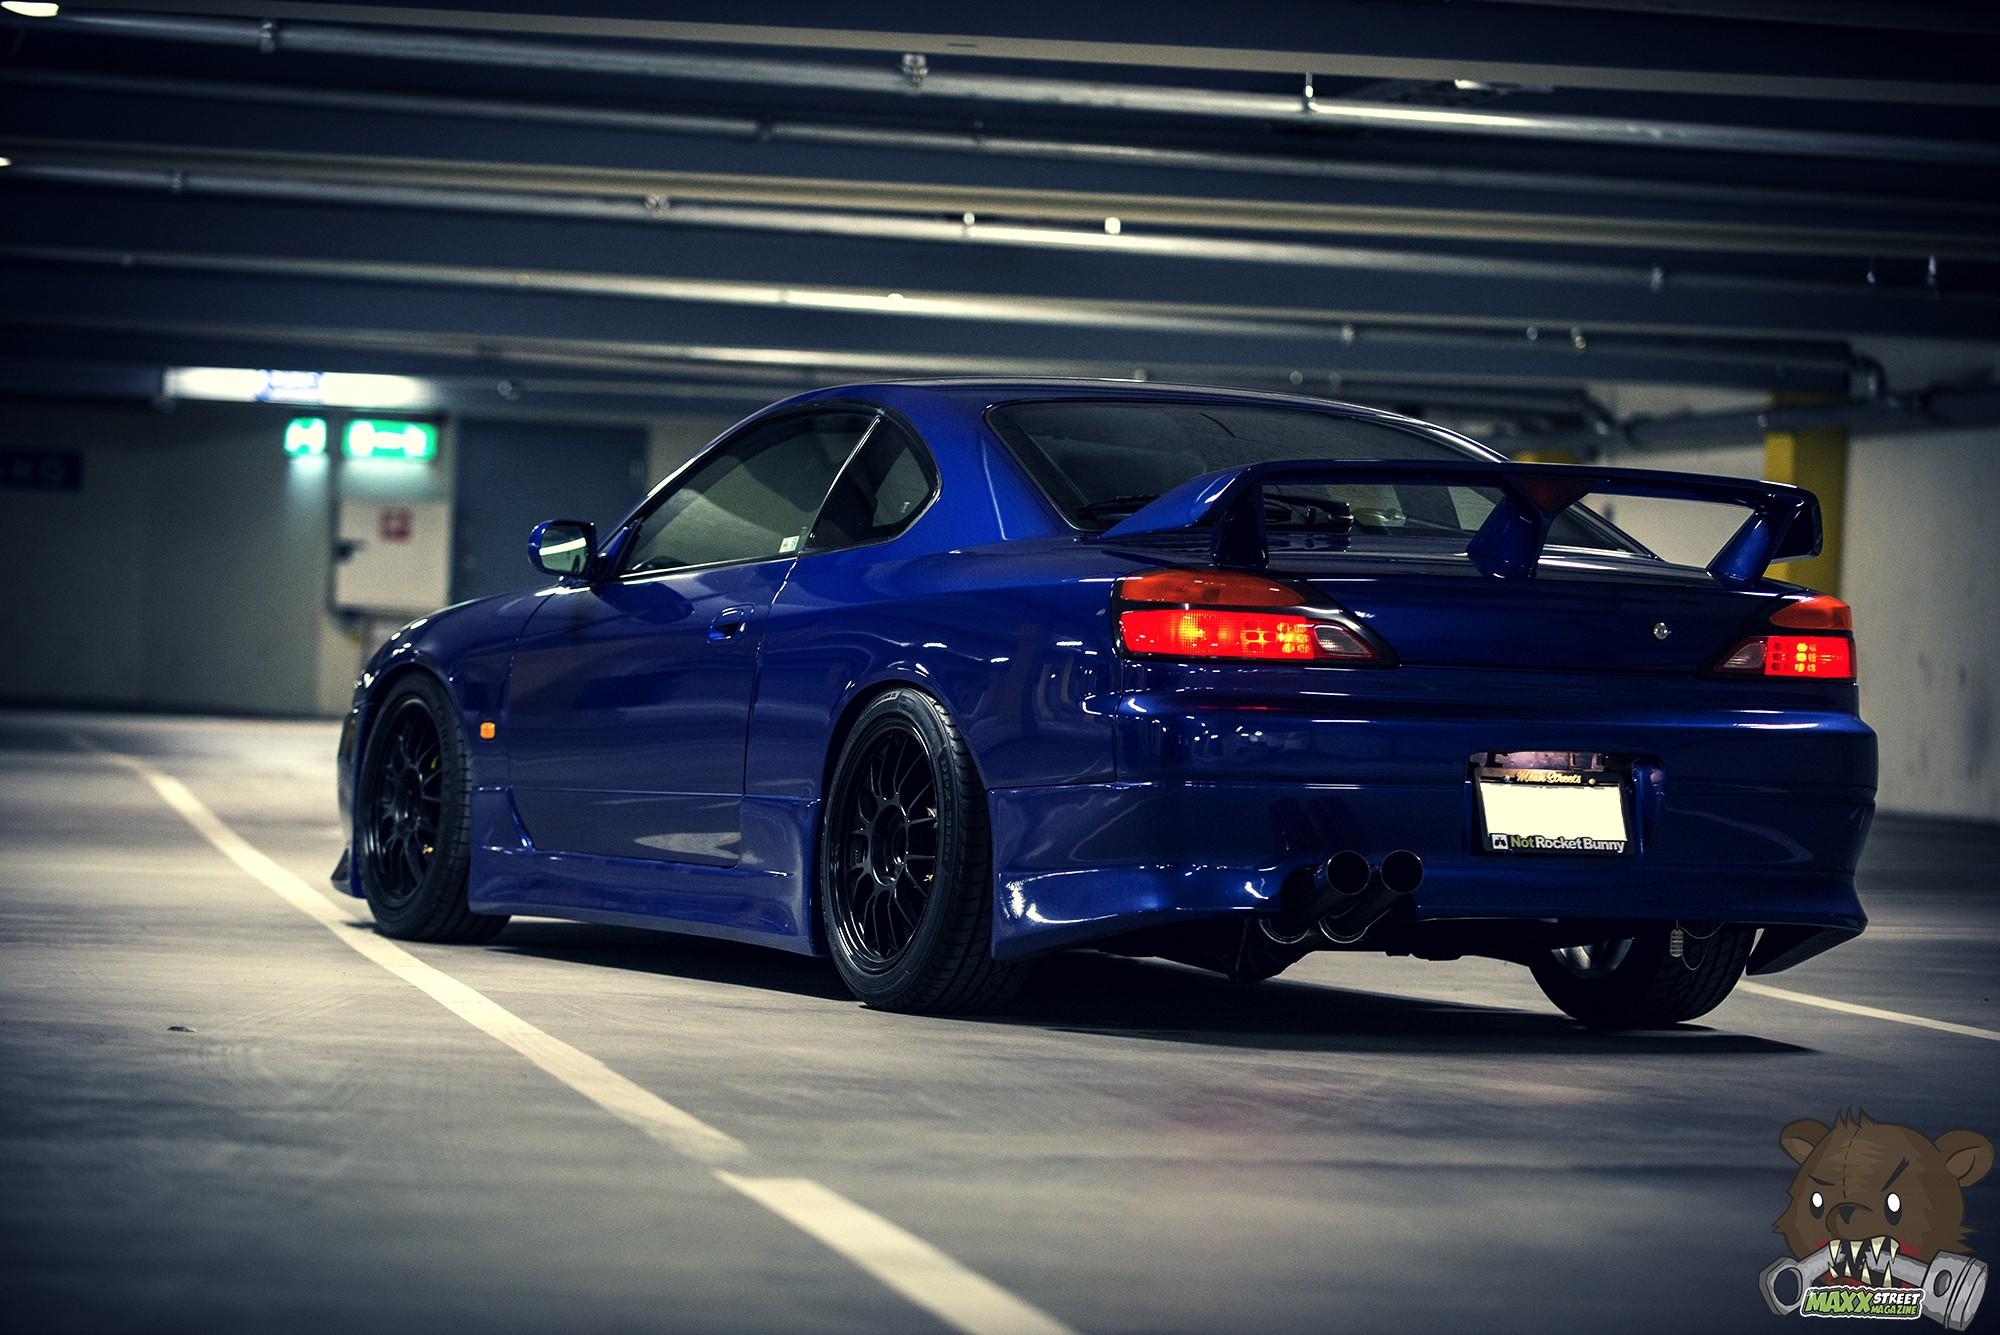 Merveilleux Wallpaper : Japanese Cars, Blue Cars, Drifting, Sports Car, Drift, Nissan  Silvia S15, Nissan Silvia Spec R, Nissan S15, JDM Lifestyle, Driftcar, ...